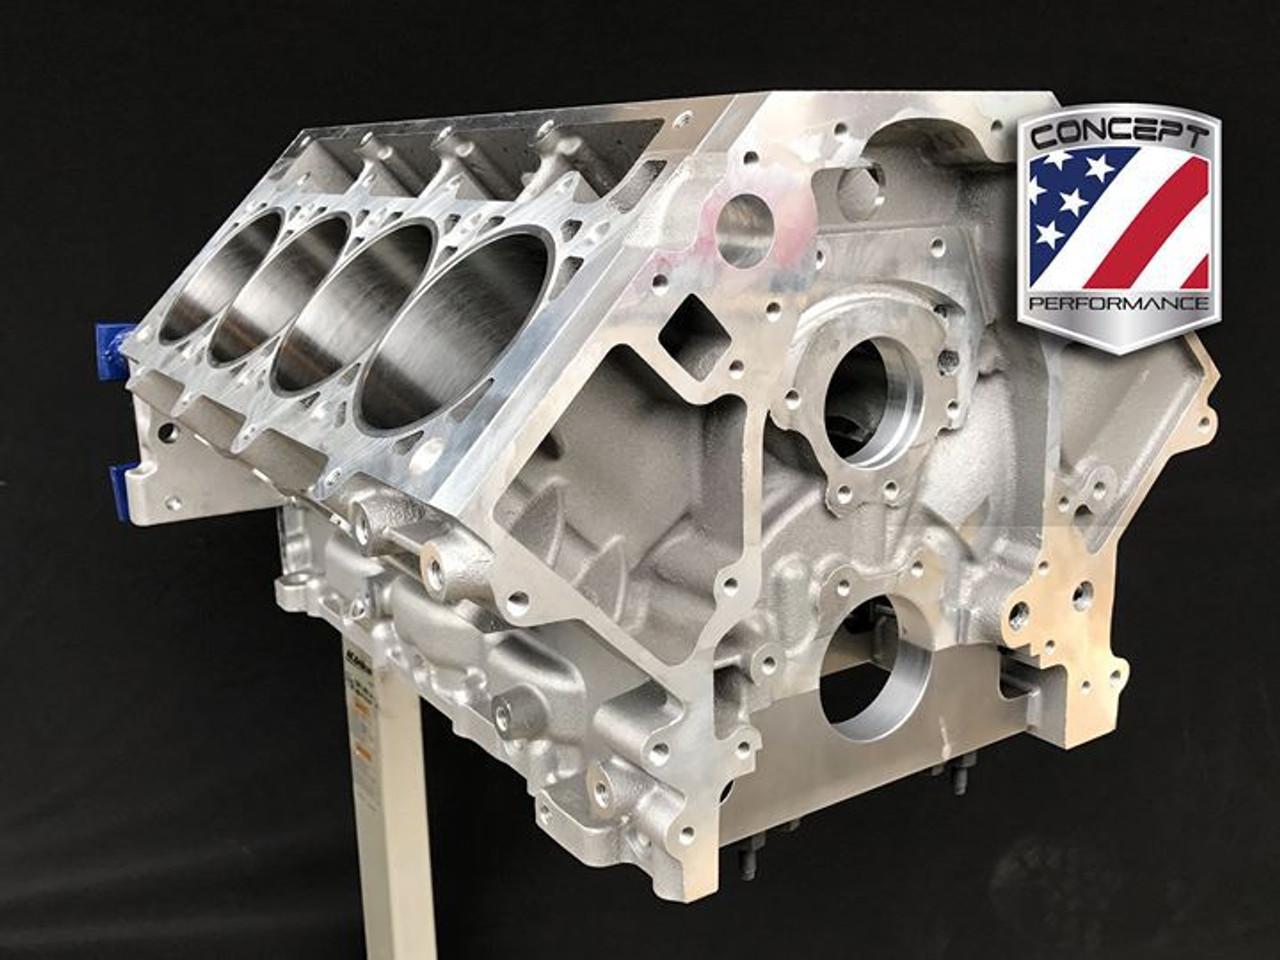 LSR 427ci Stroker Engine | Race Engine | Low Compression